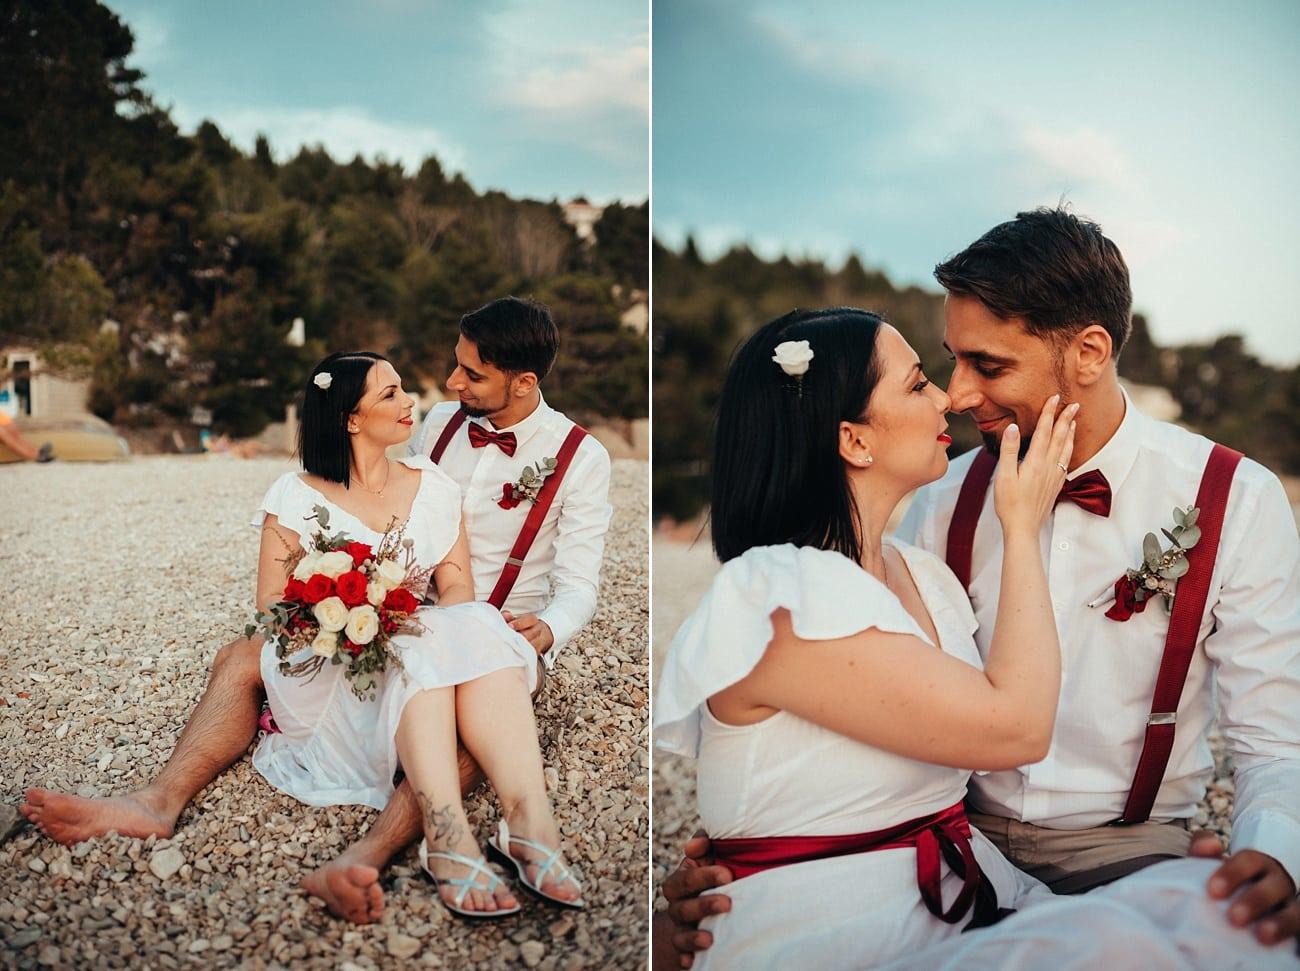 biokovo skywalk wedding photographer 0028 - Biokovo Skywalk Wedding